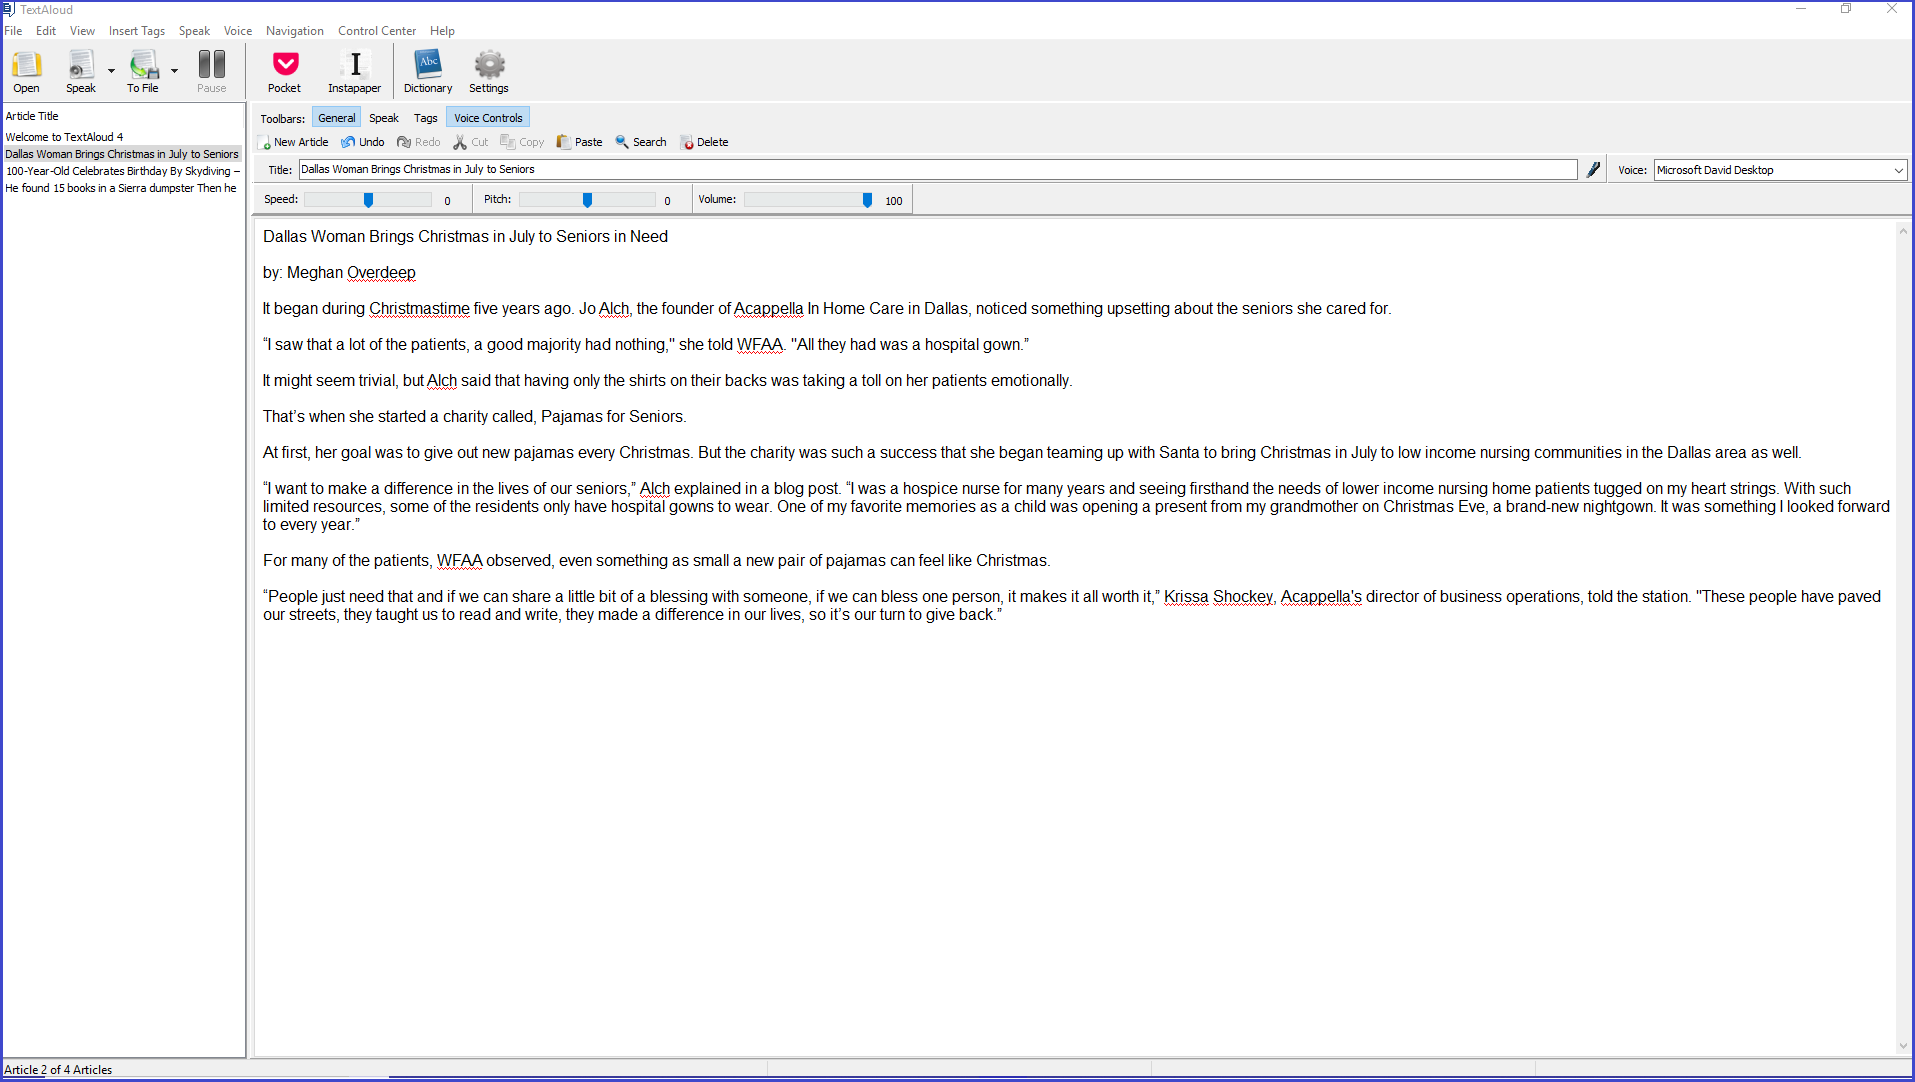 Upgrade to TextAloud 4 Text to Speech Software